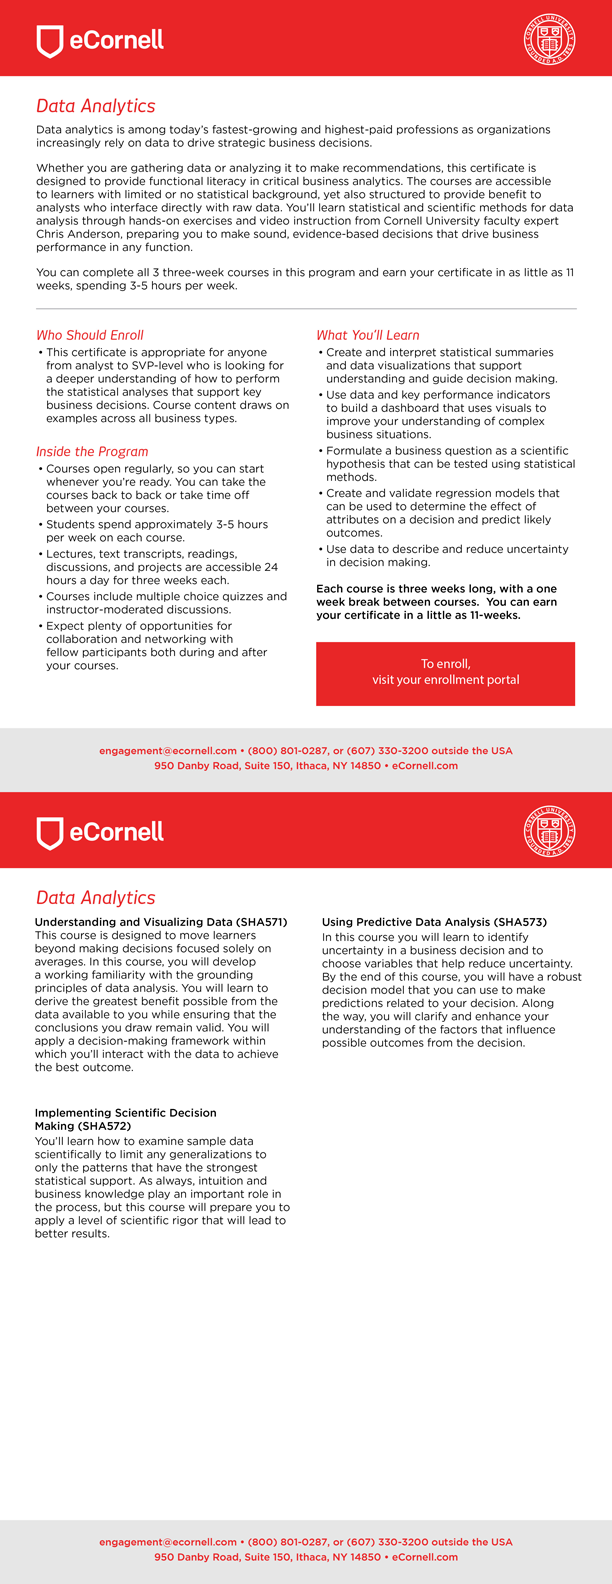 Data Analytics Flyer for Corporations